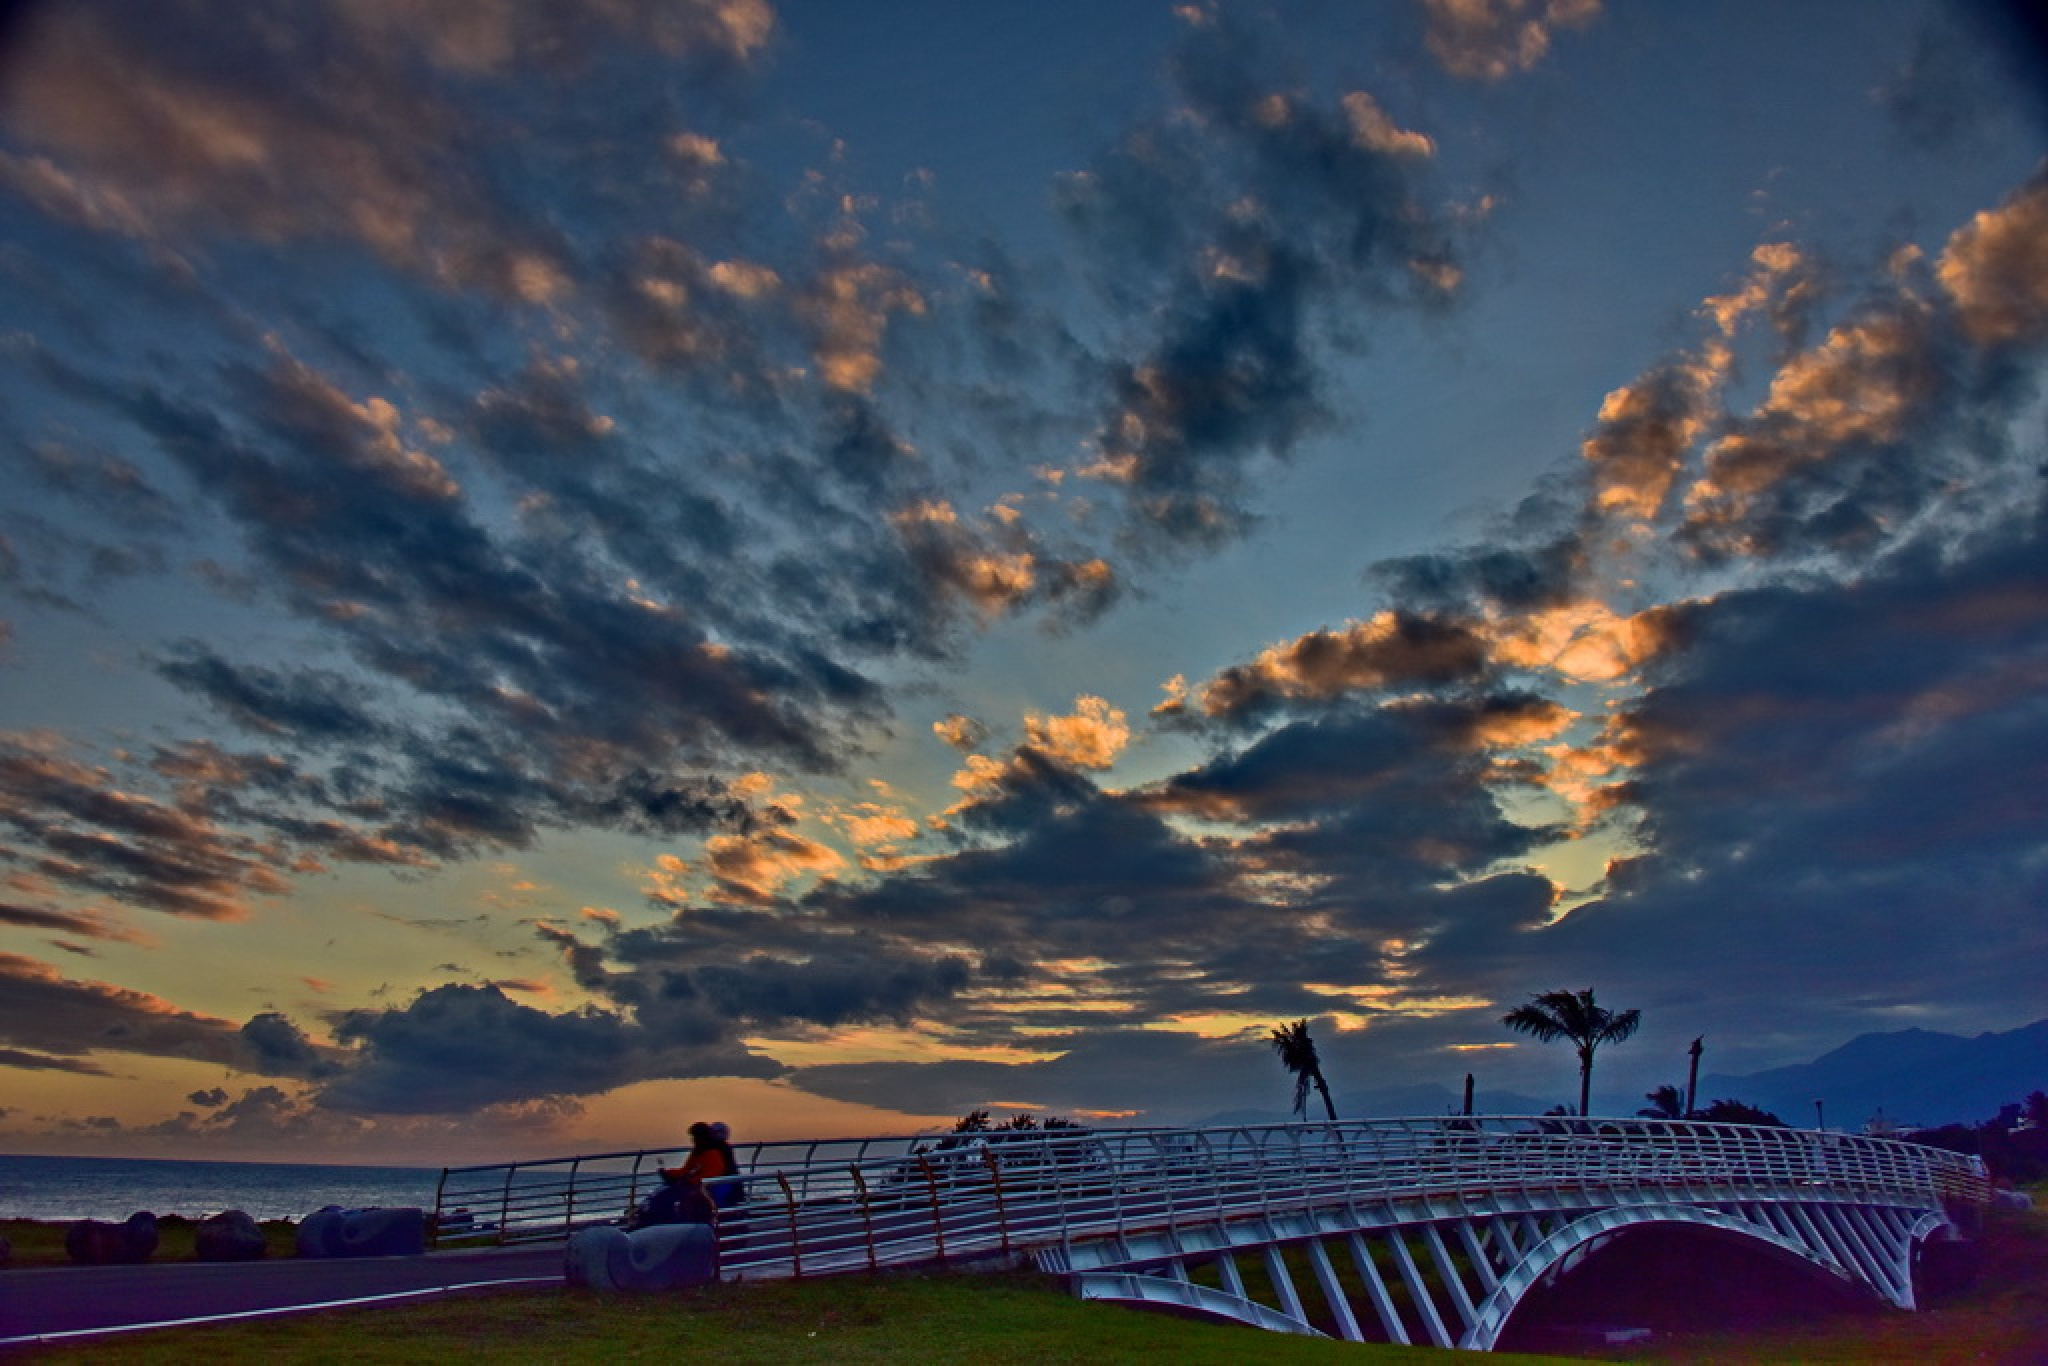 Sunset in beach park Taiwan Taitung. by petertyghbn